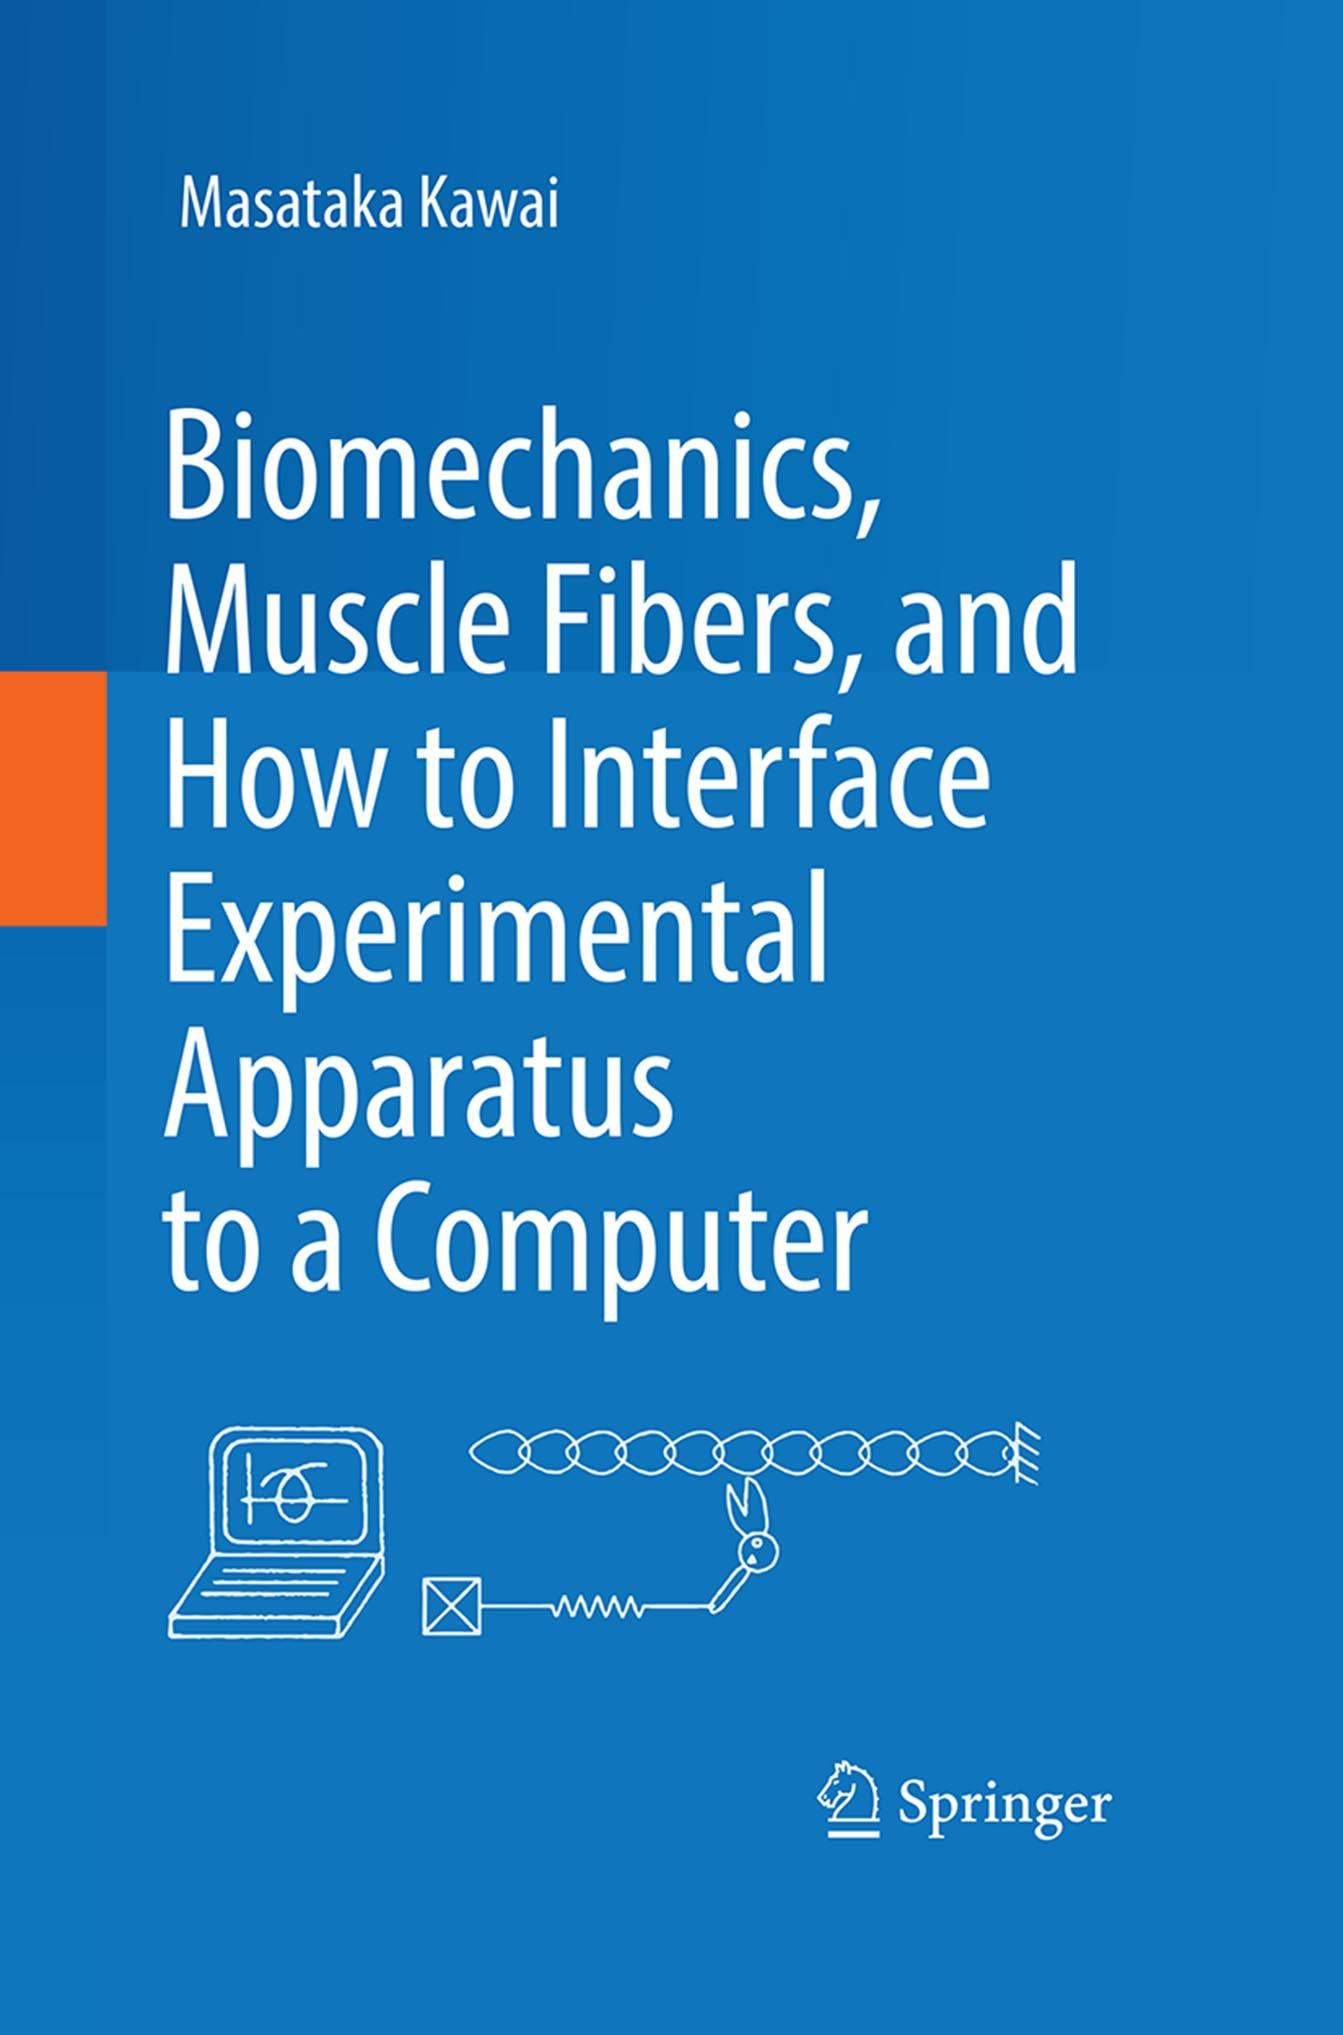 Kawai, Masataka - Biomechanics, Muscle Fibers, and How to Interface Experimental Apparatus to a Computer, ebook